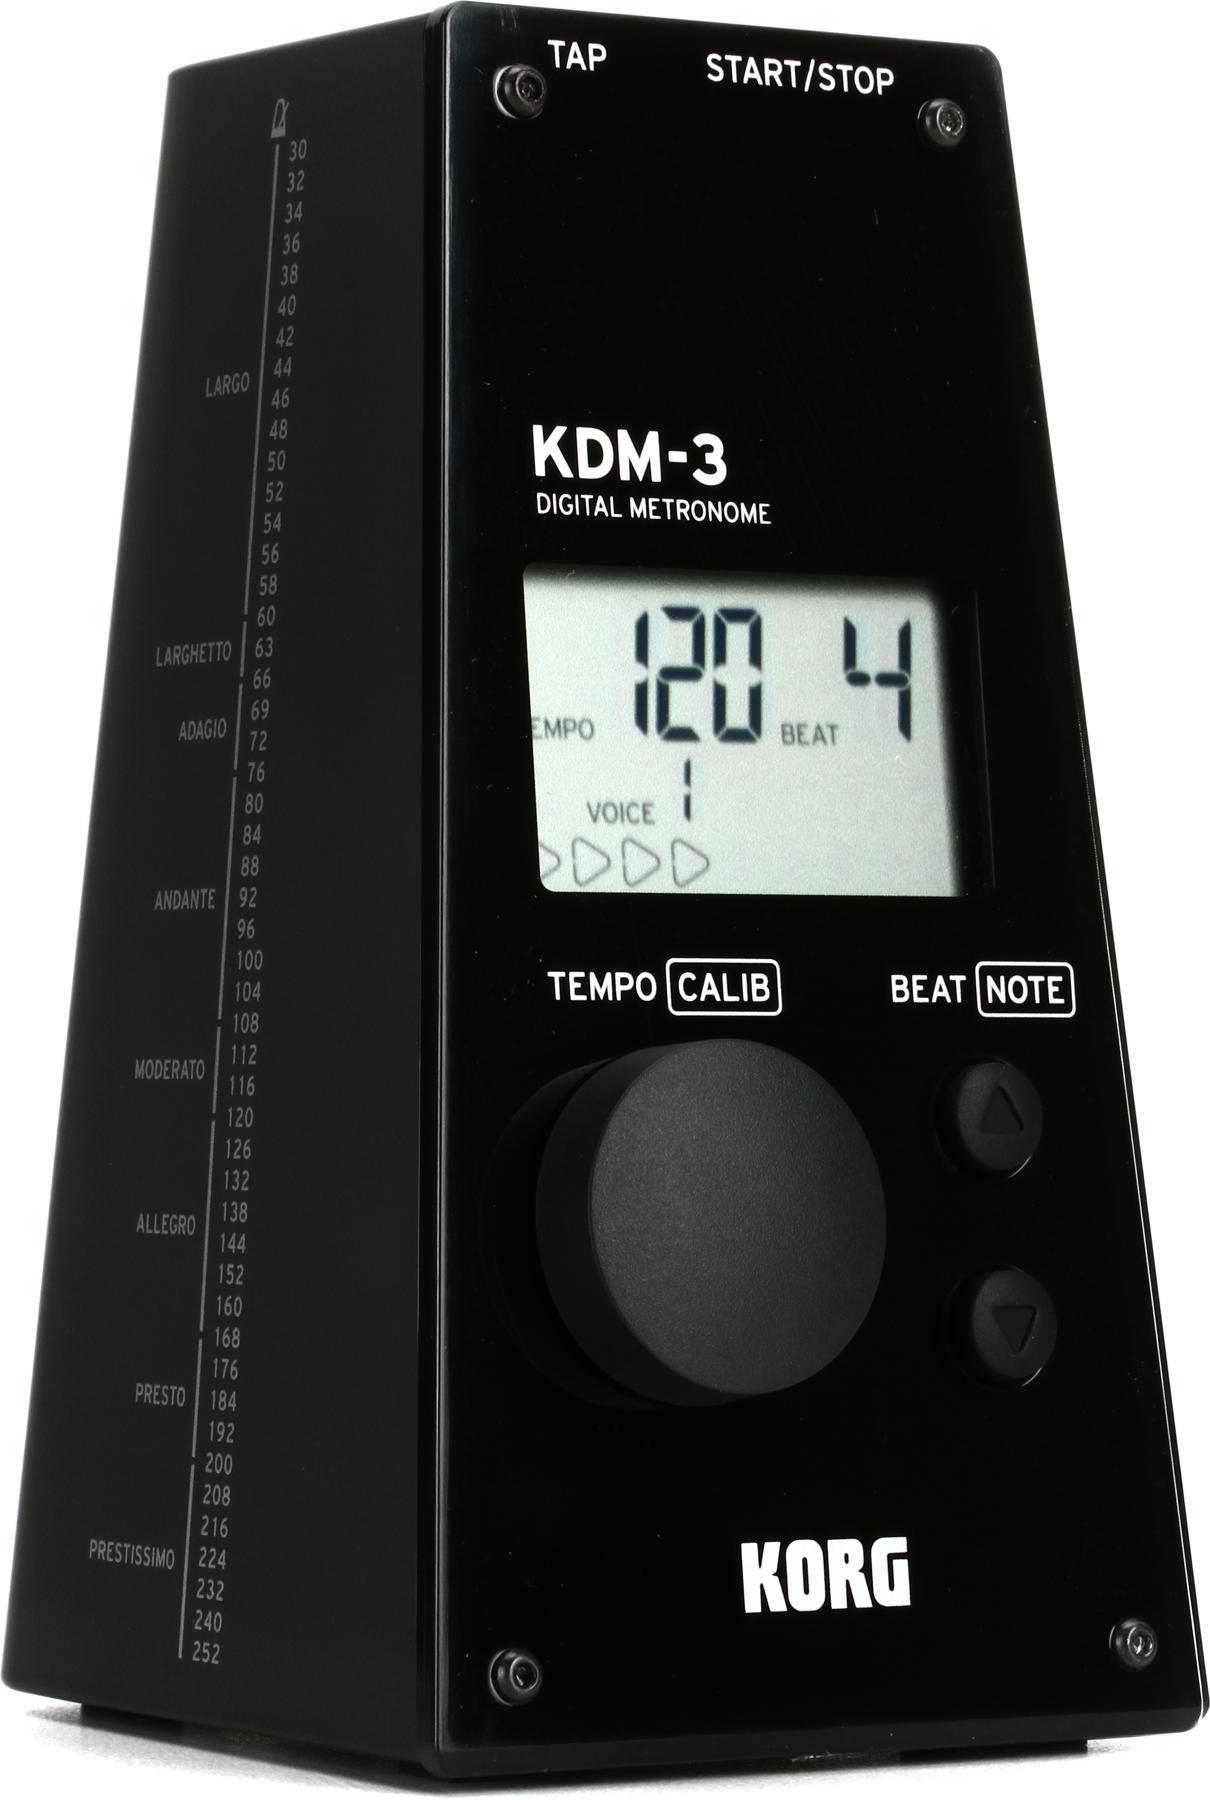 2. Korg KDM-3 Digital Metronome